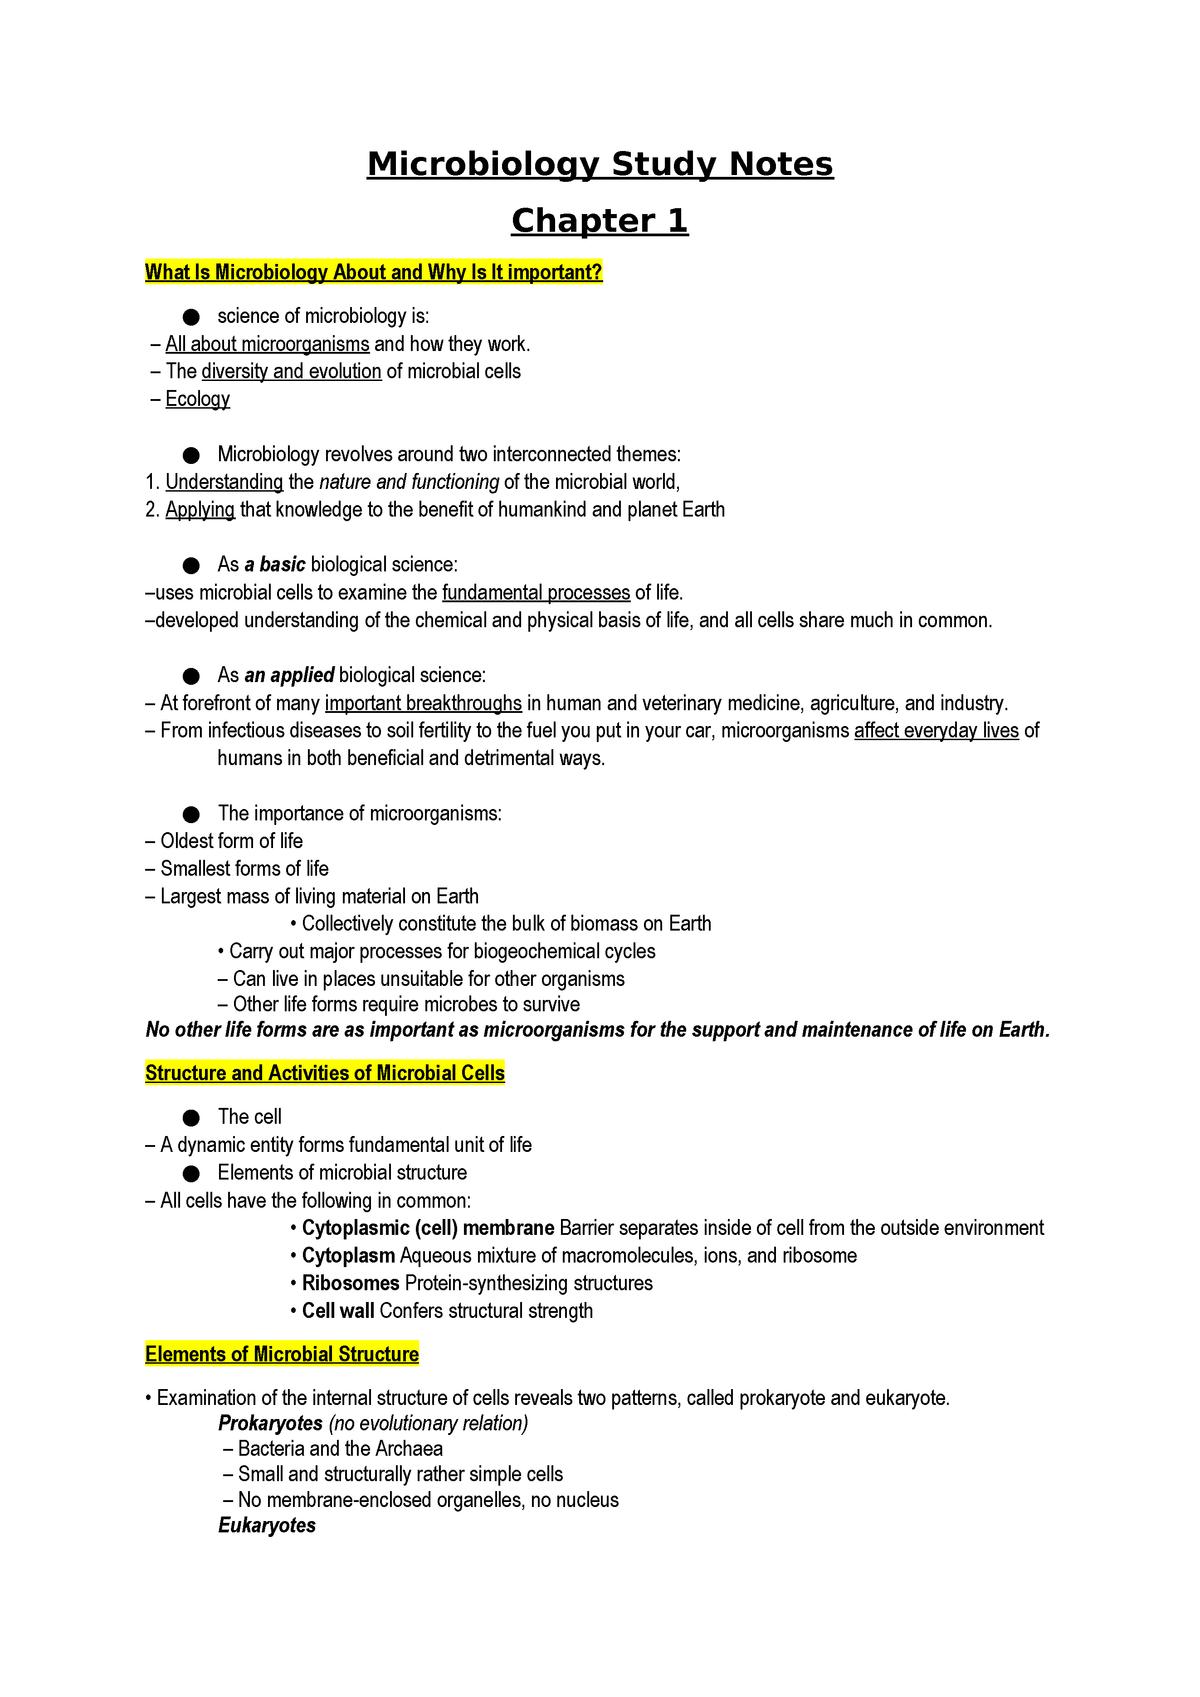 Microbiology Study Notes - Biology BLGY1683 - StuDocu